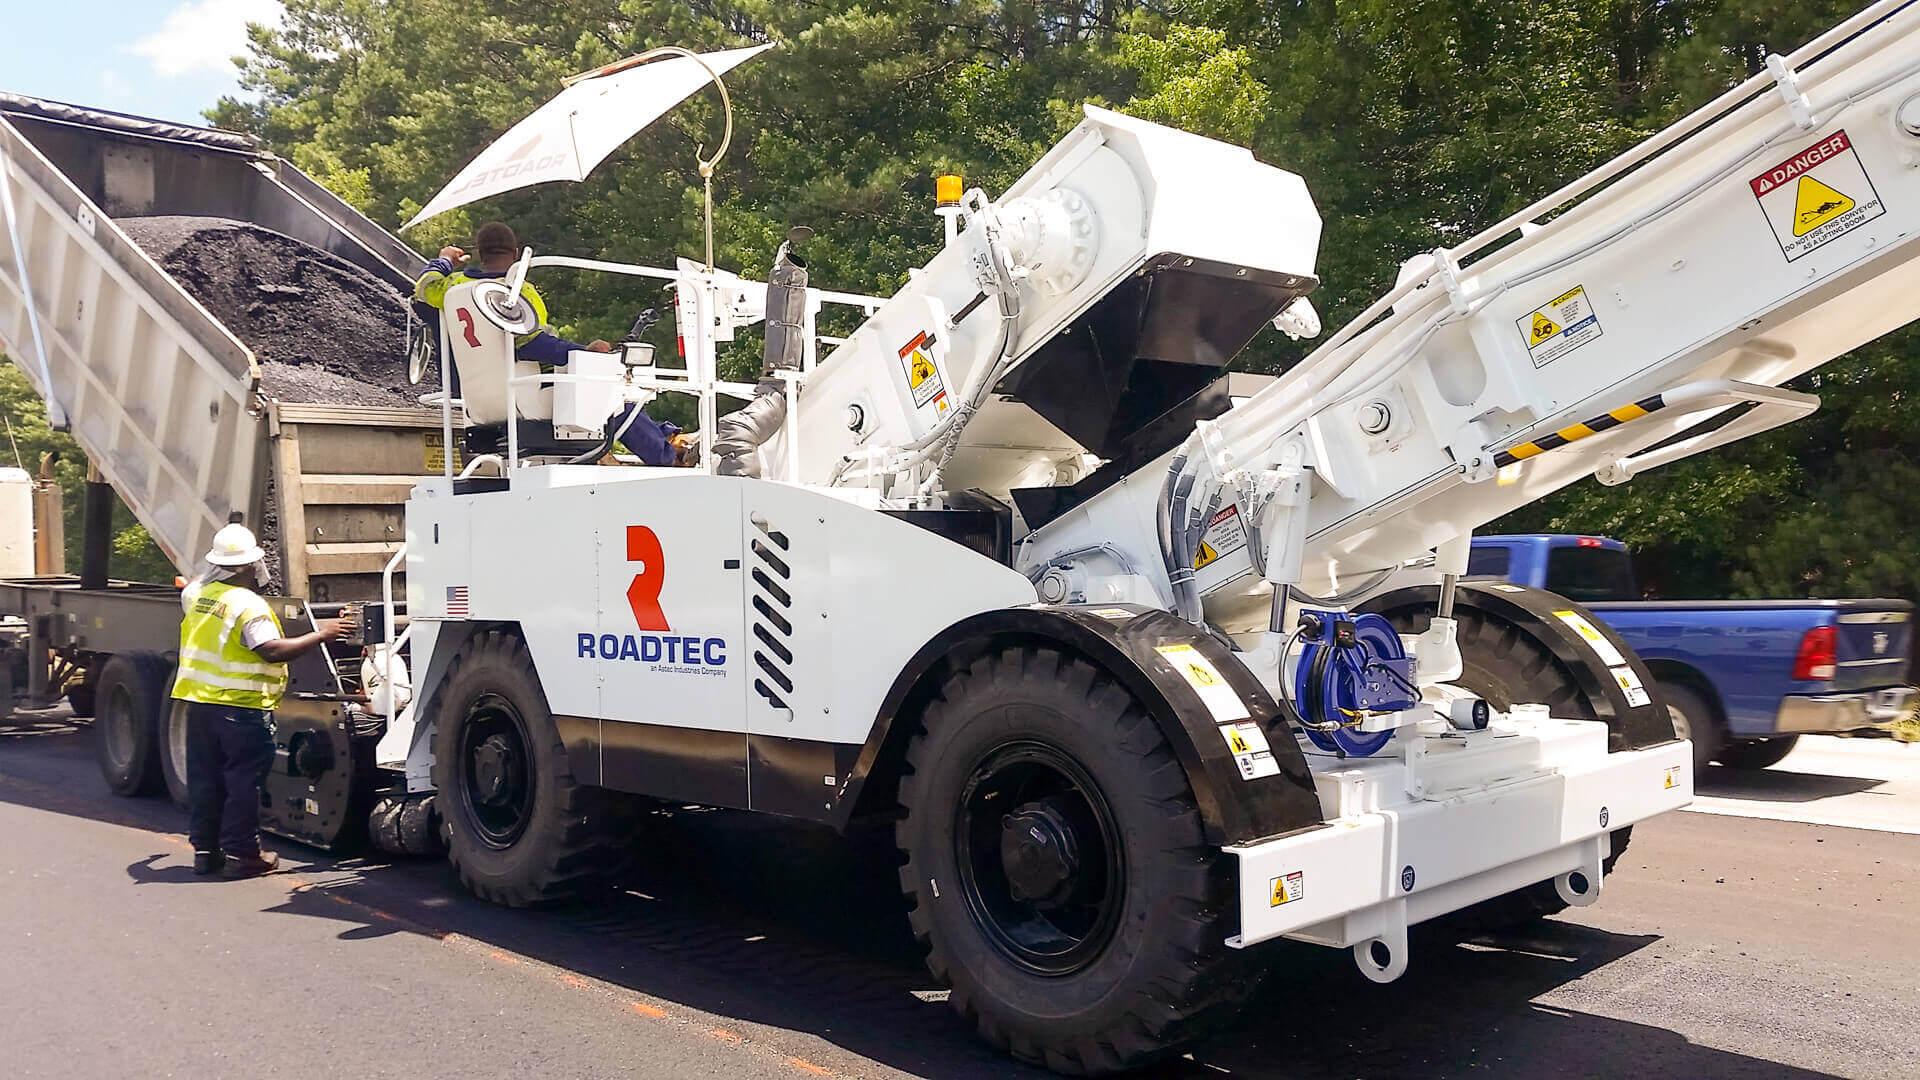 Roadtec MTV-1100 Material Transfer Vehicle